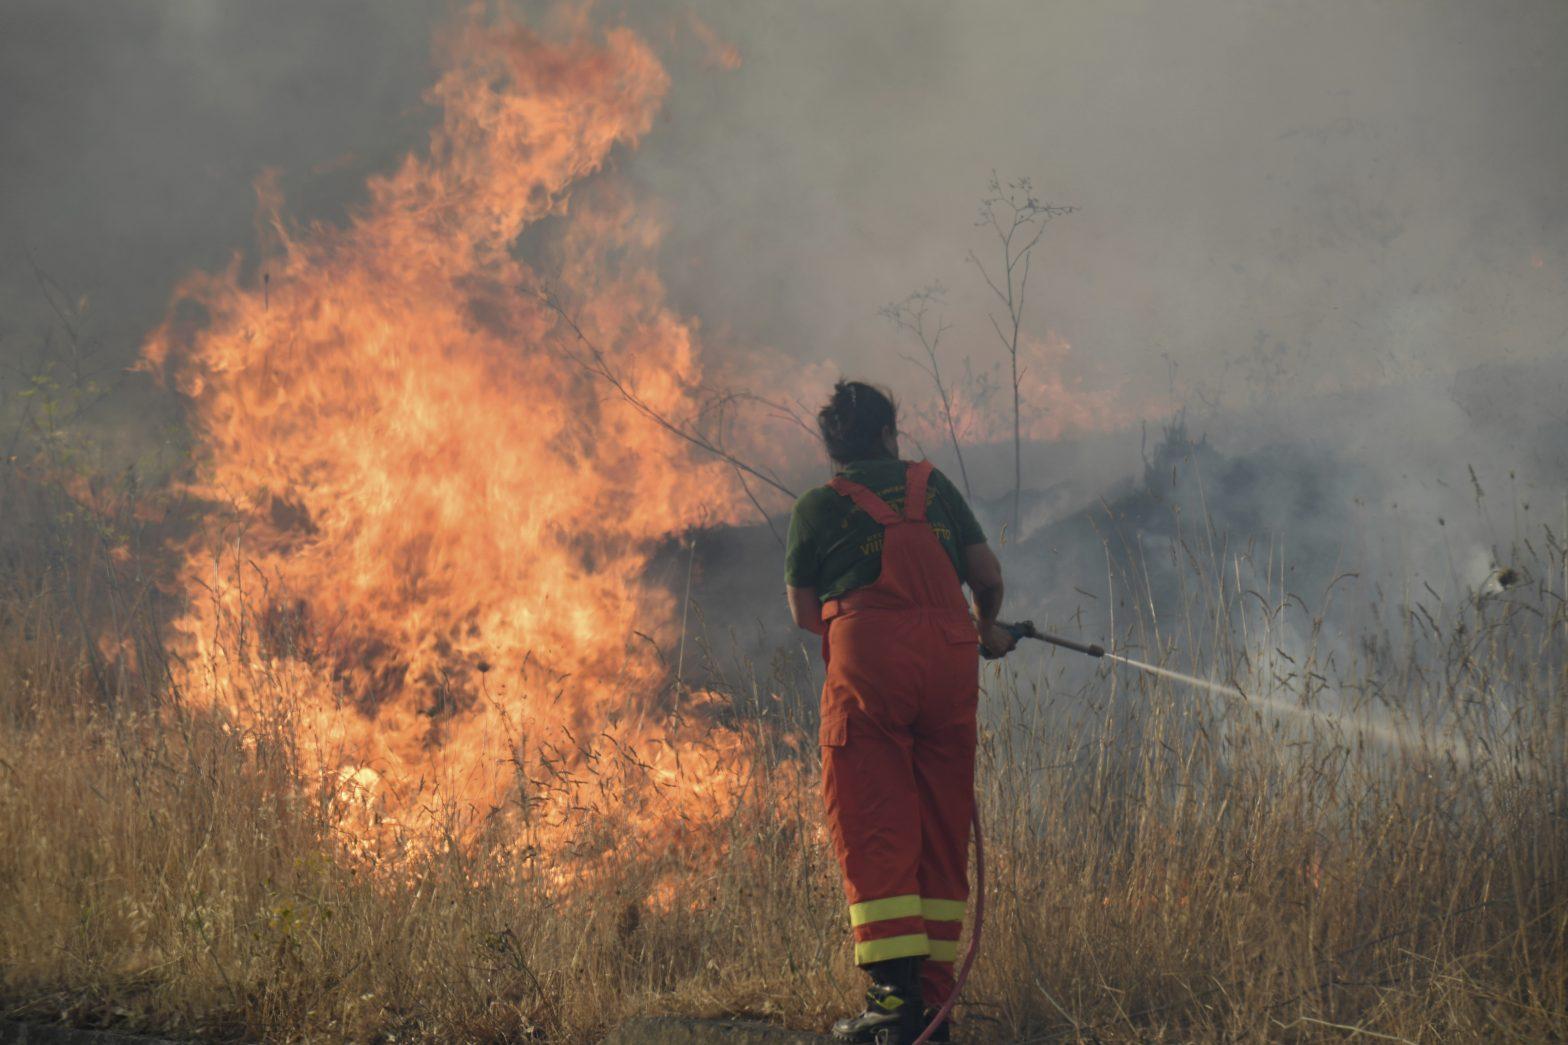 Sicily Wildfires